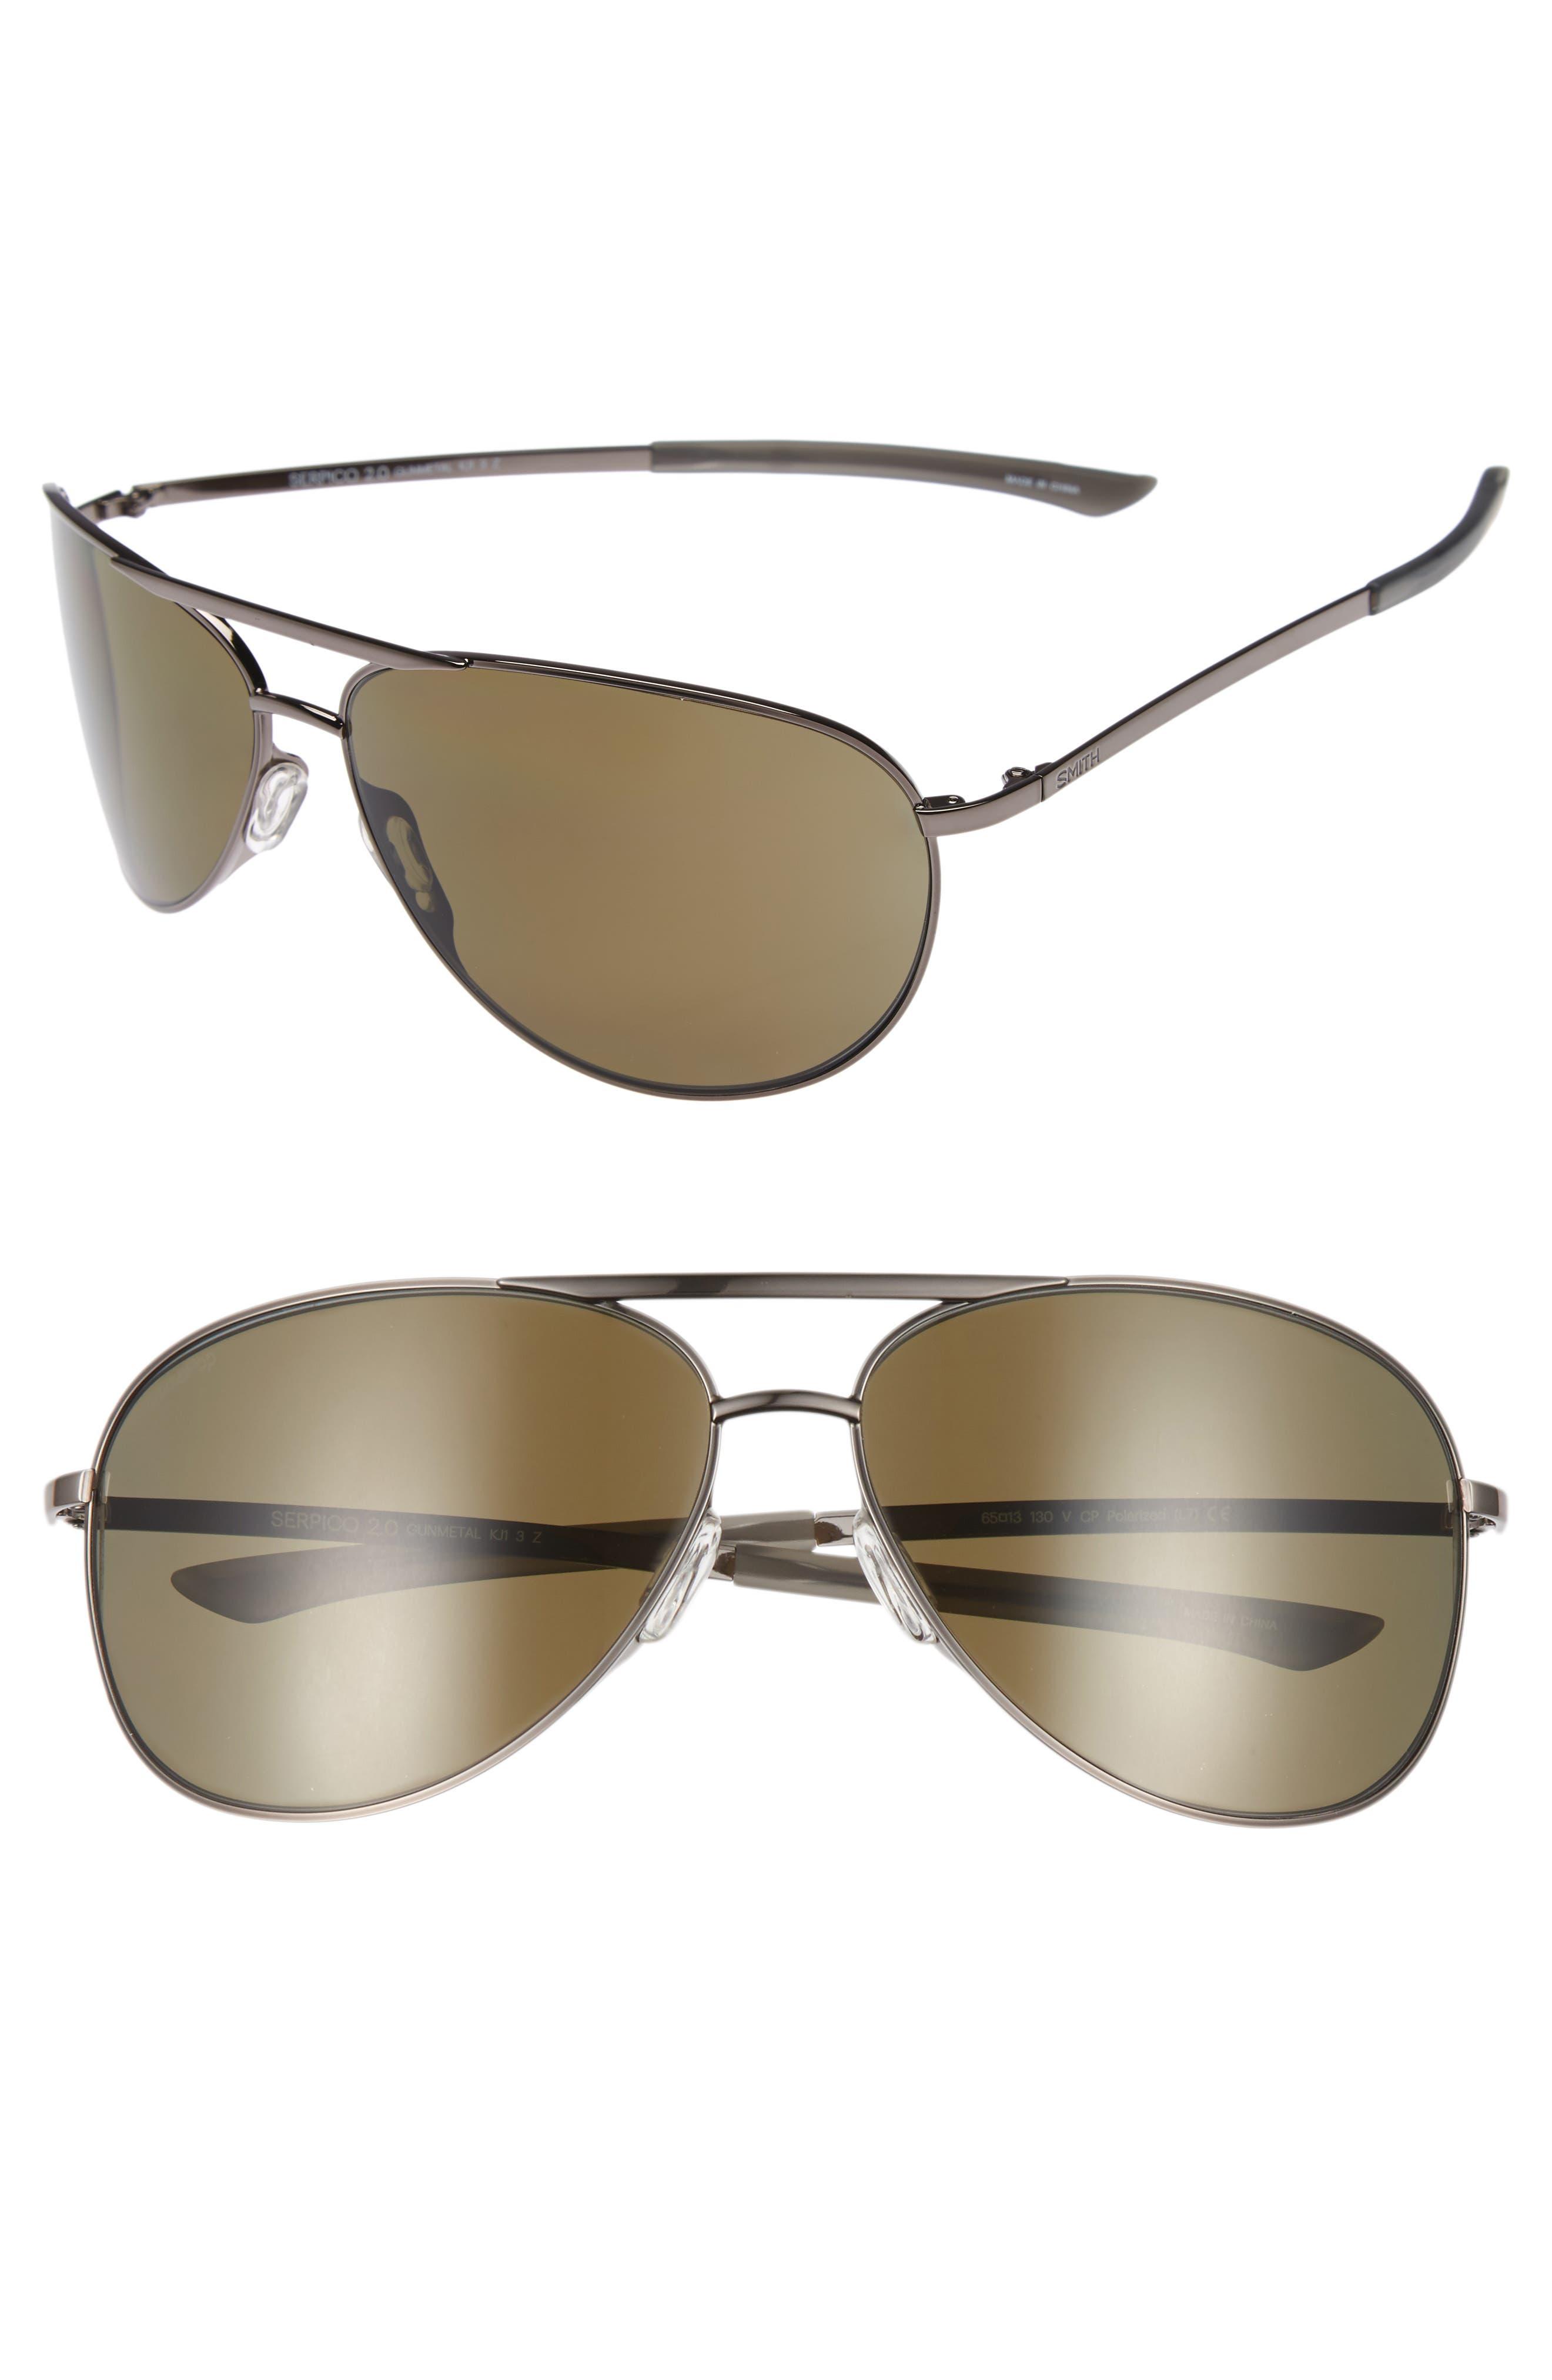 SMITH Serpico Slim 2.0 65mm ChromaPop<sup>™</sup> Polarized Aviator Sunglasses, Main, color, 040